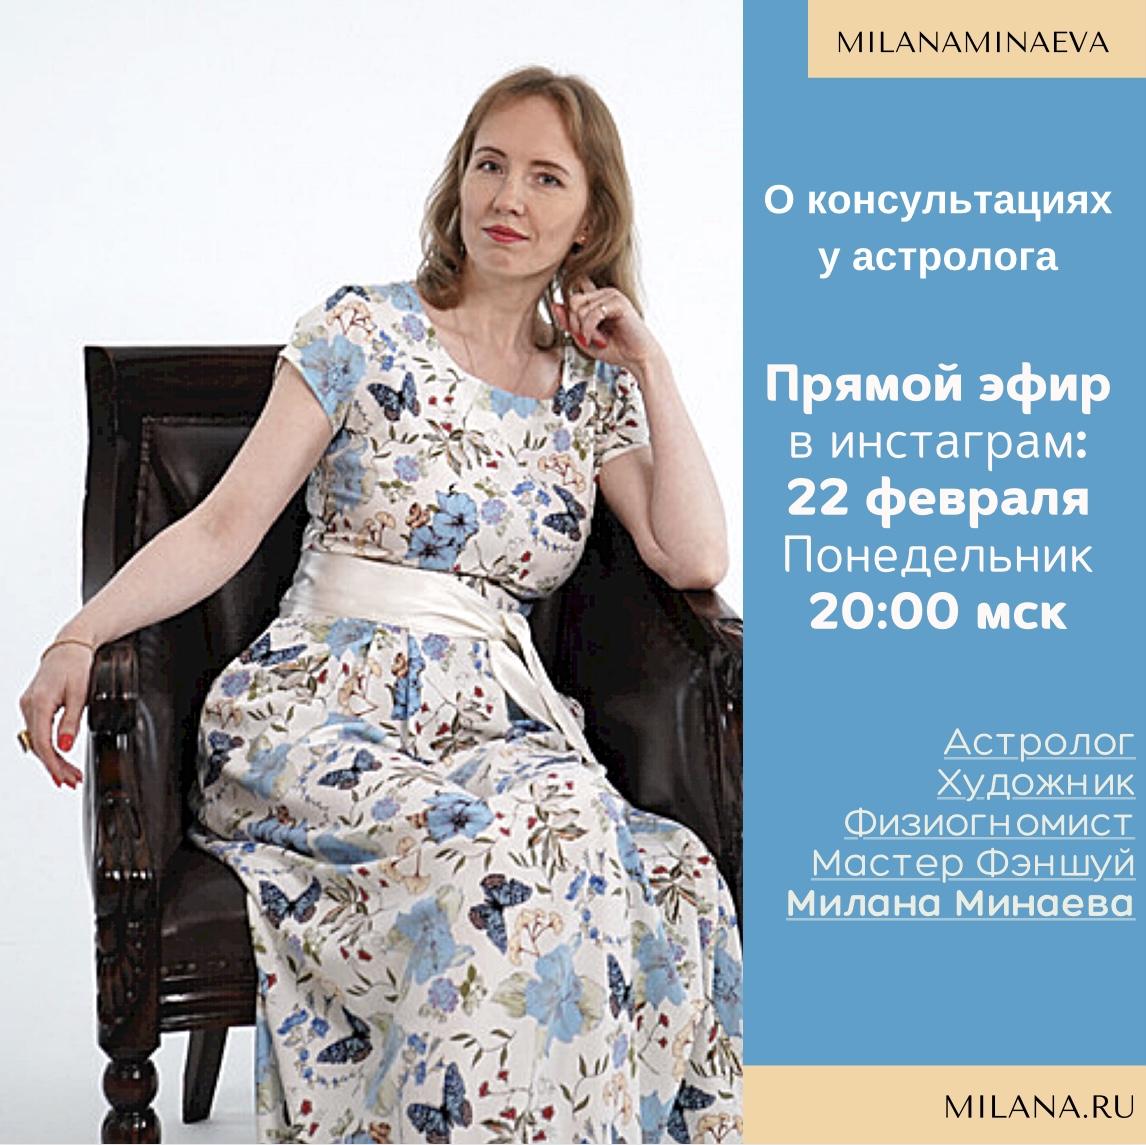 Милана Минаева - о консультациях у астролога